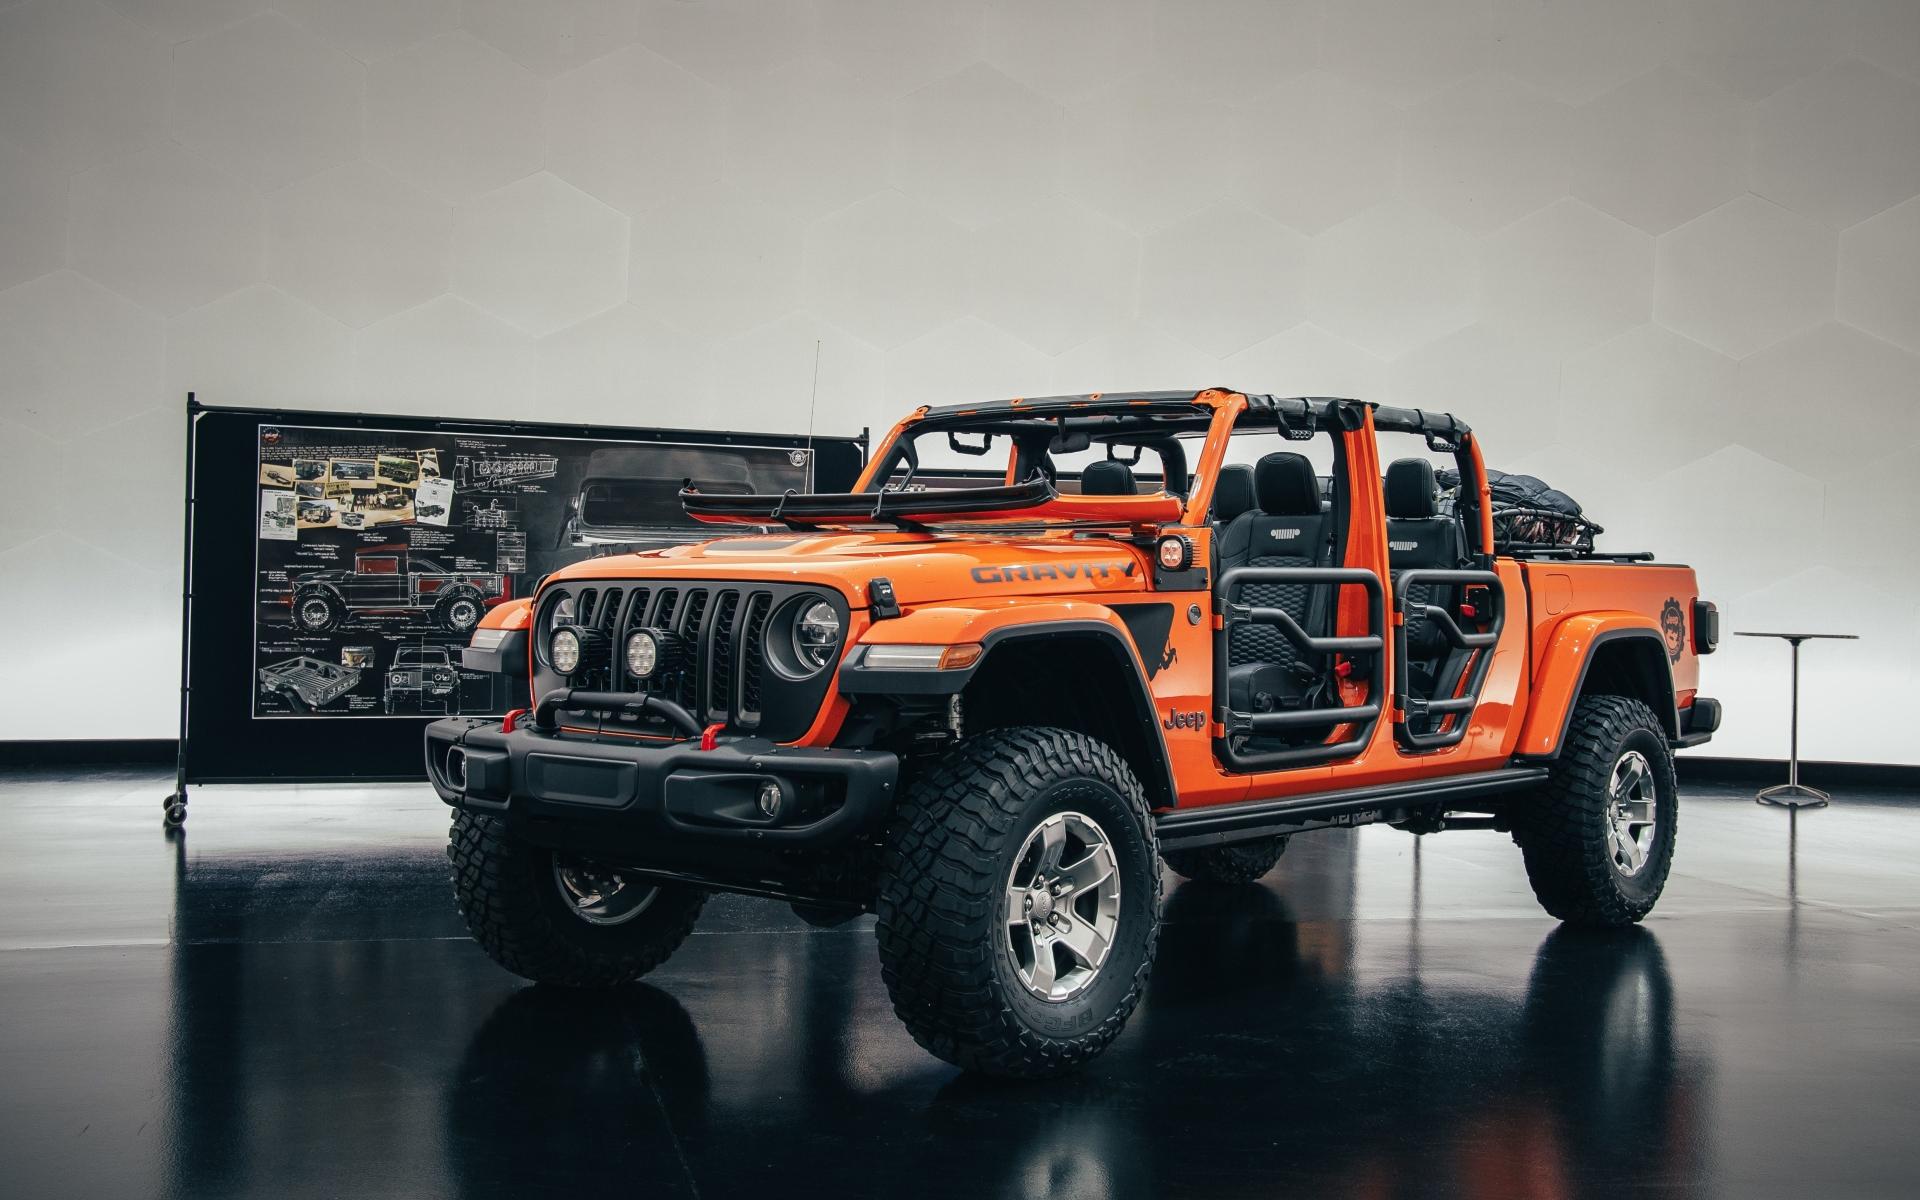 1920x1200 Jeep Gladiator Gravity 1200P Wallpaper, HD Cars ...